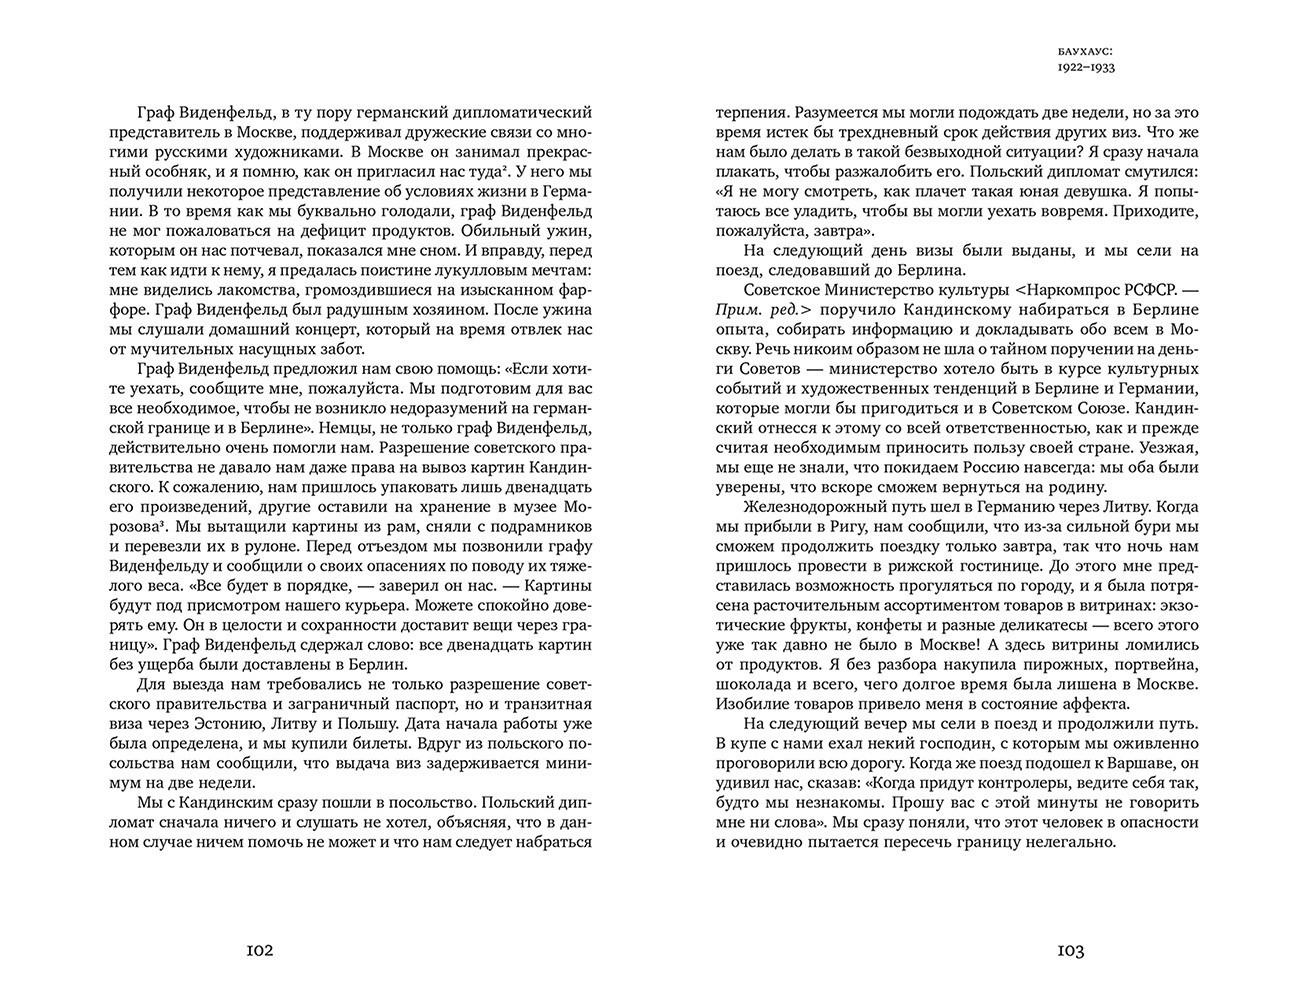 kandinsky-4